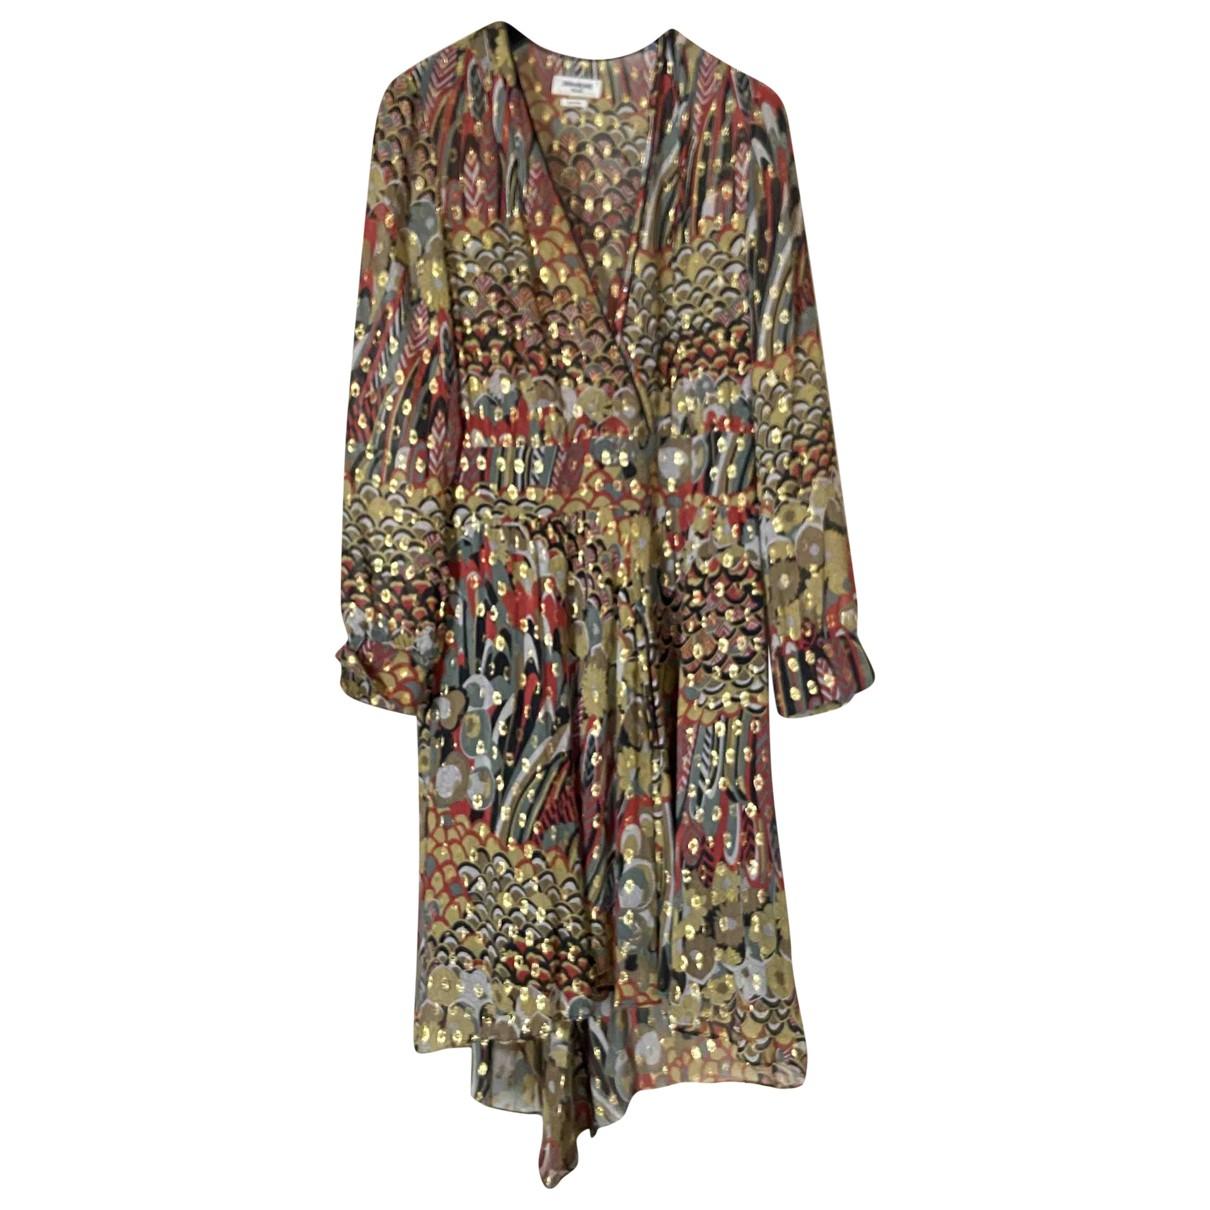 Zadig & Voltaire \N Silk dress for Women 40 FR